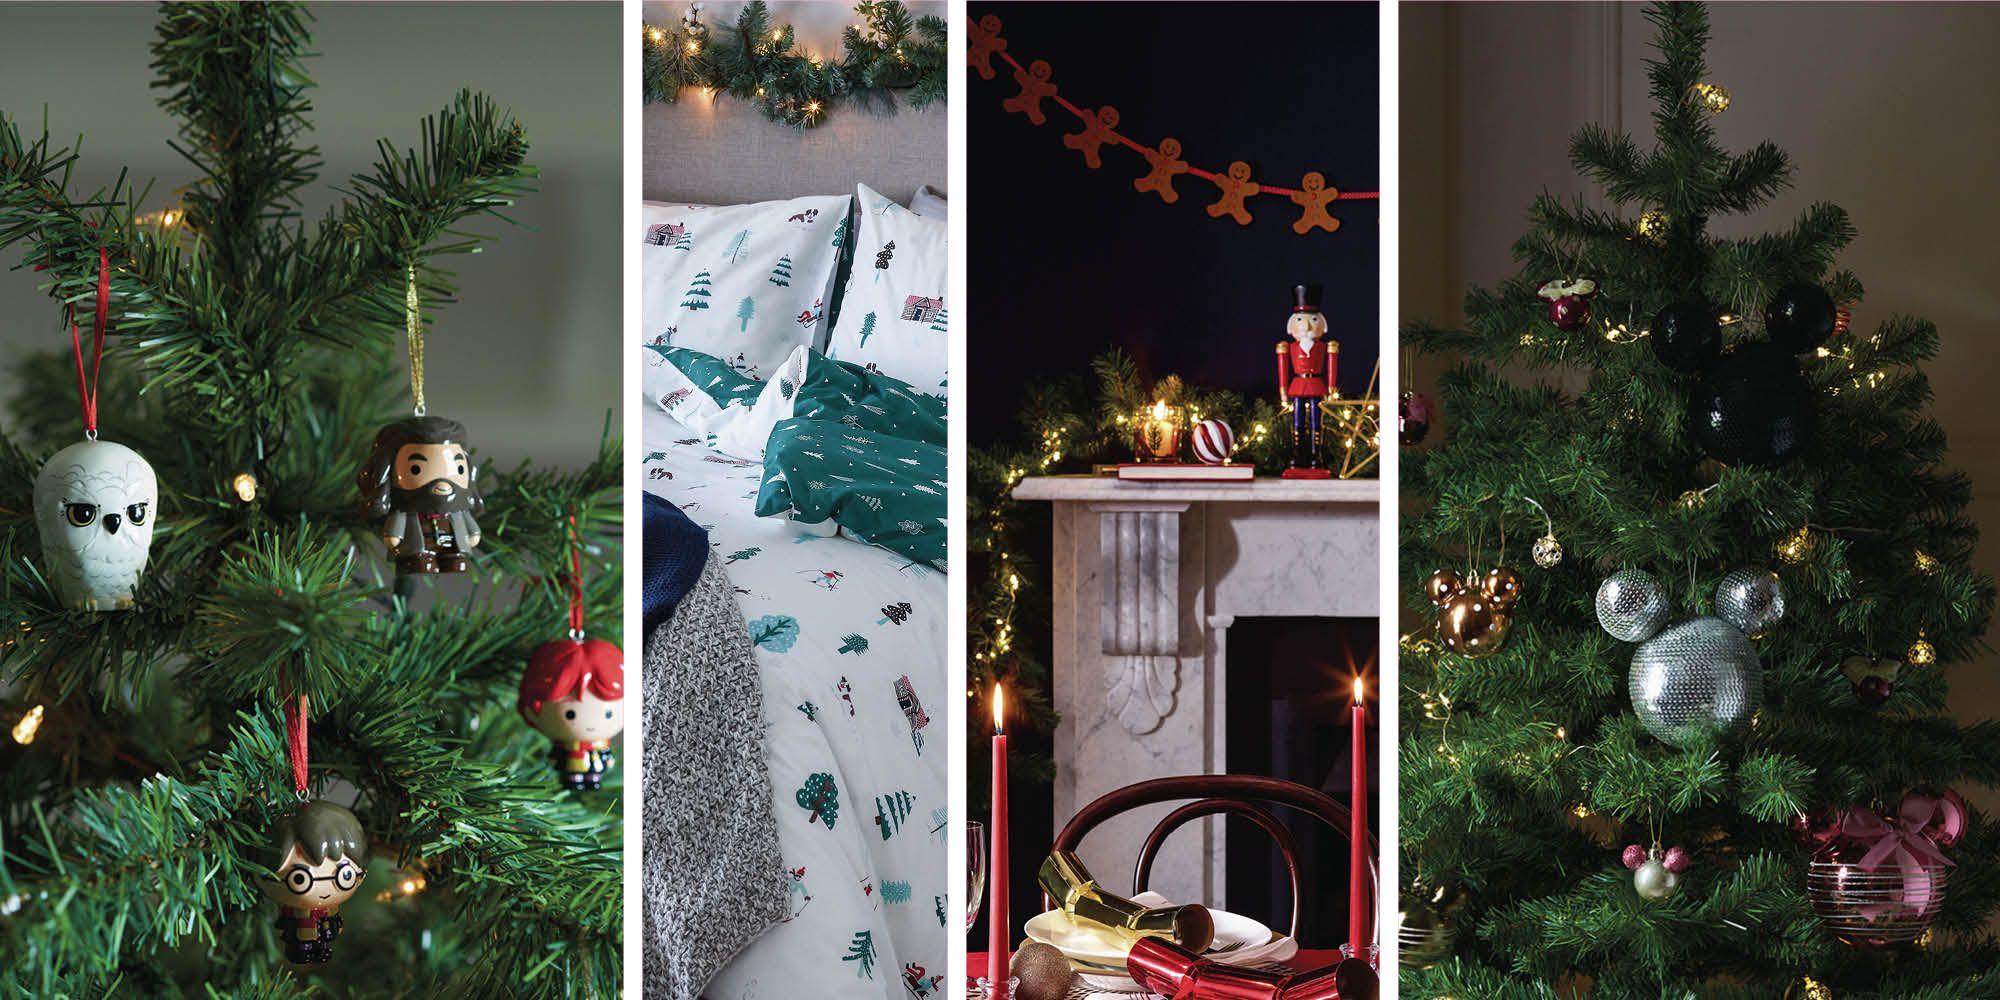 Primark's Christmas homeware range features Harry Potter and Disney decorations